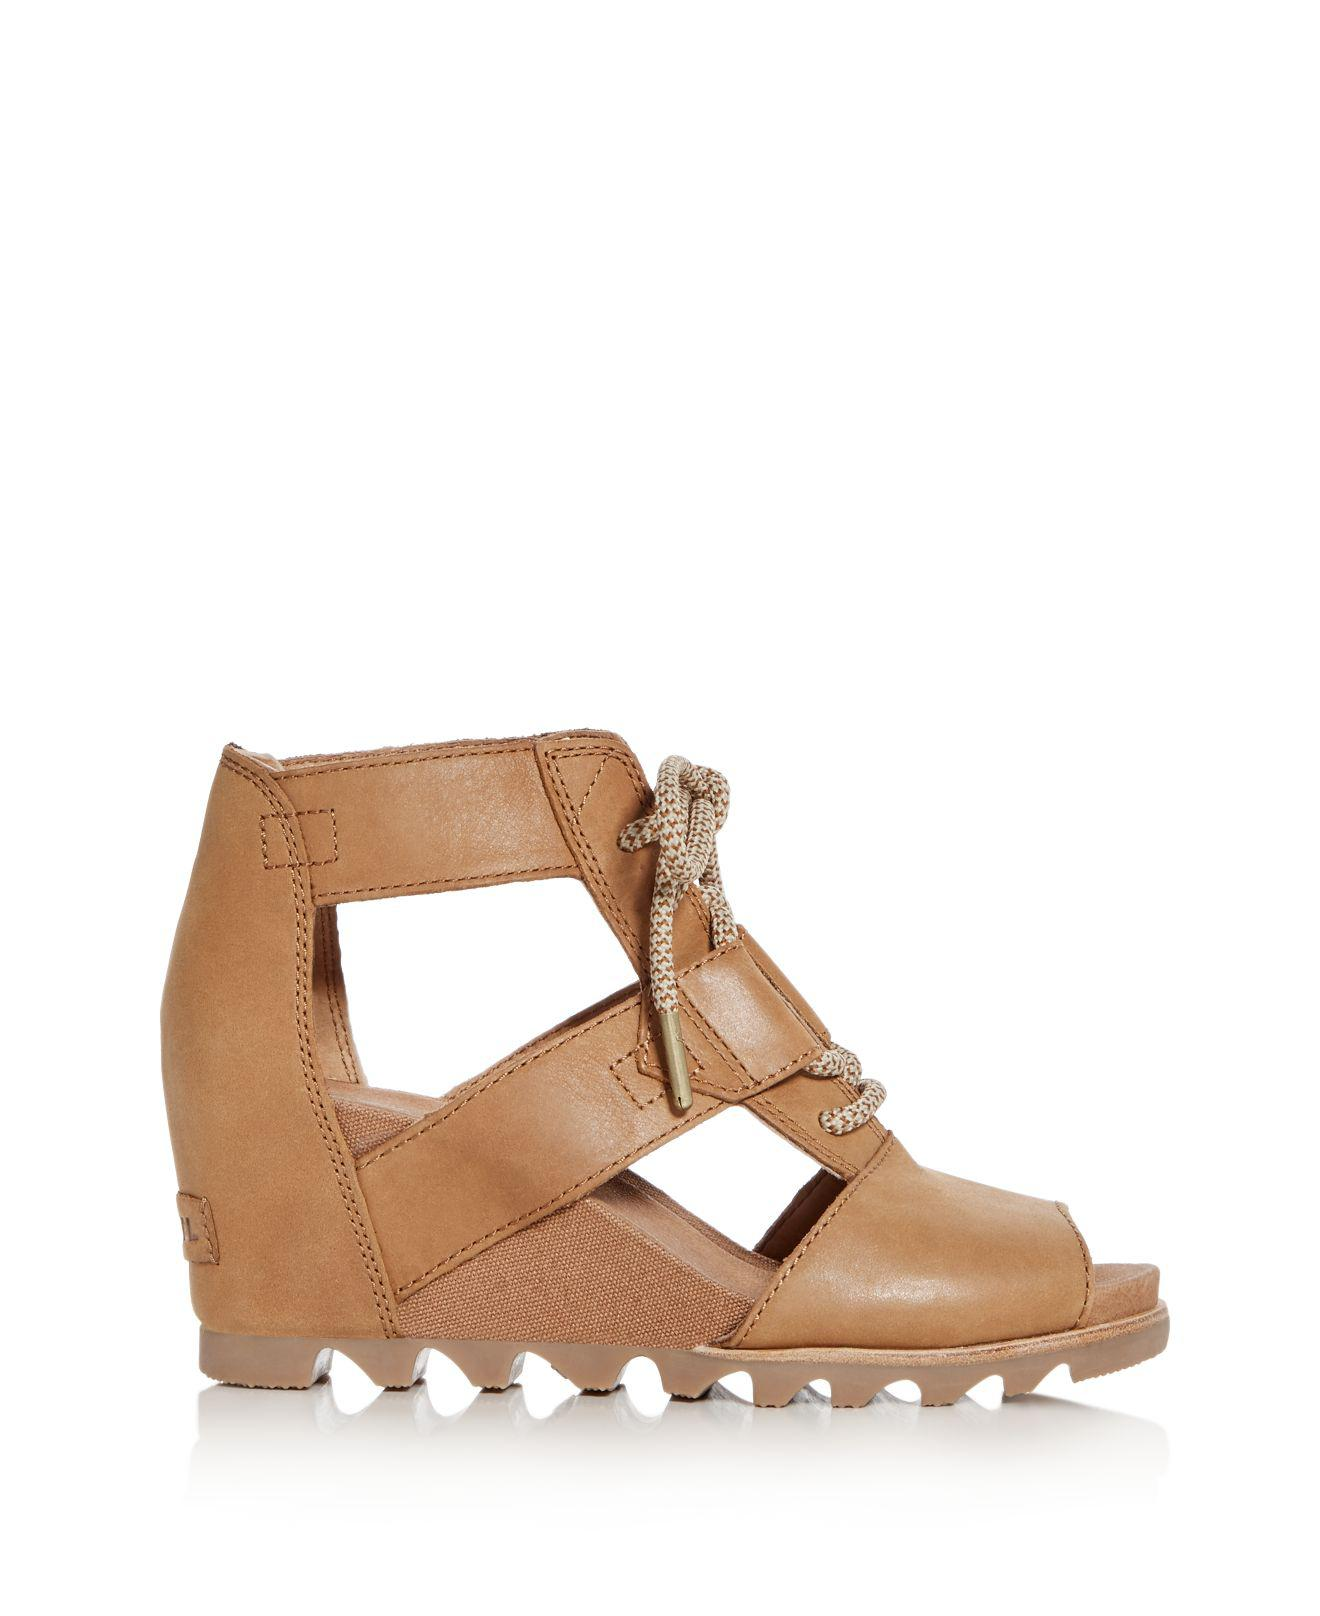 sorel Women's Joanie Nubuck Leather Platform Wedge Sandals